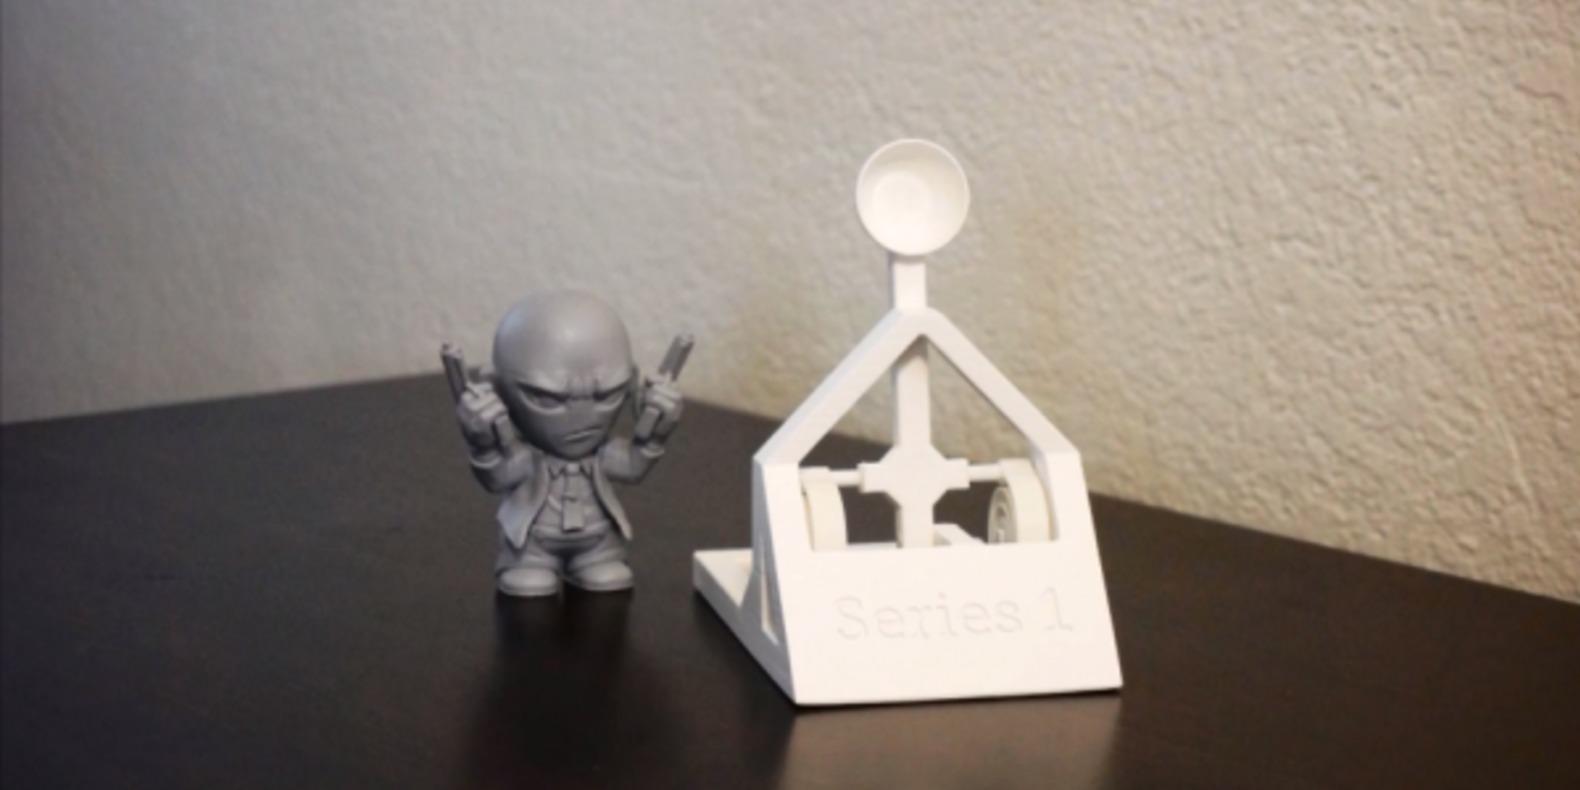 cults jouet catapulte fichier 3D Ponoko imprimante 3D 2